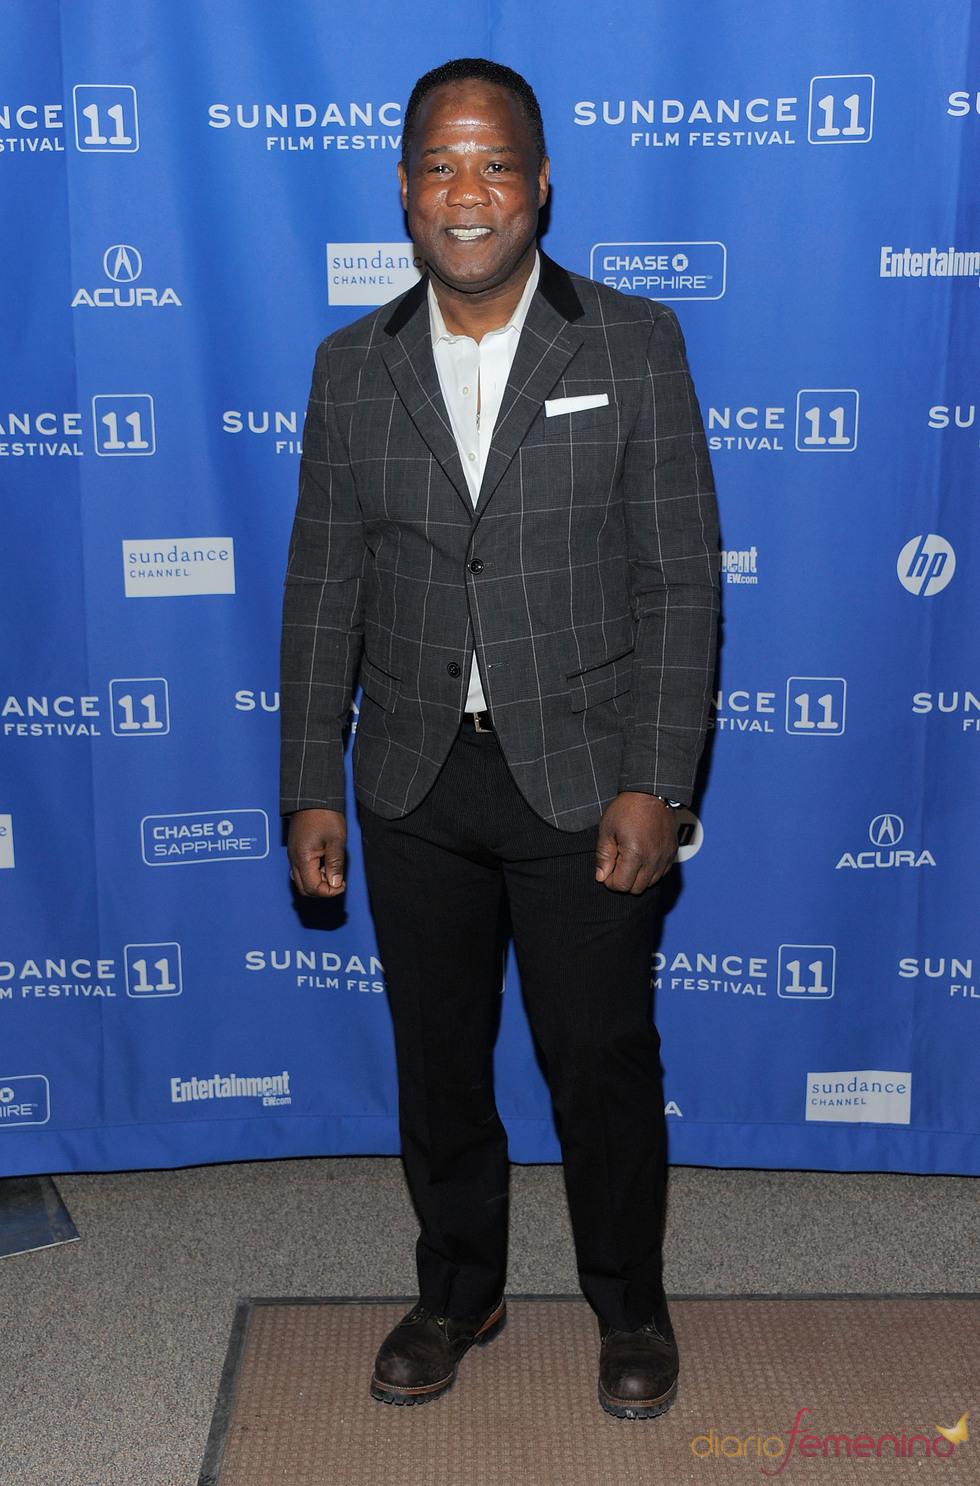 Isiah Whitlock Jr en el Festival de Cine Sundance 2011